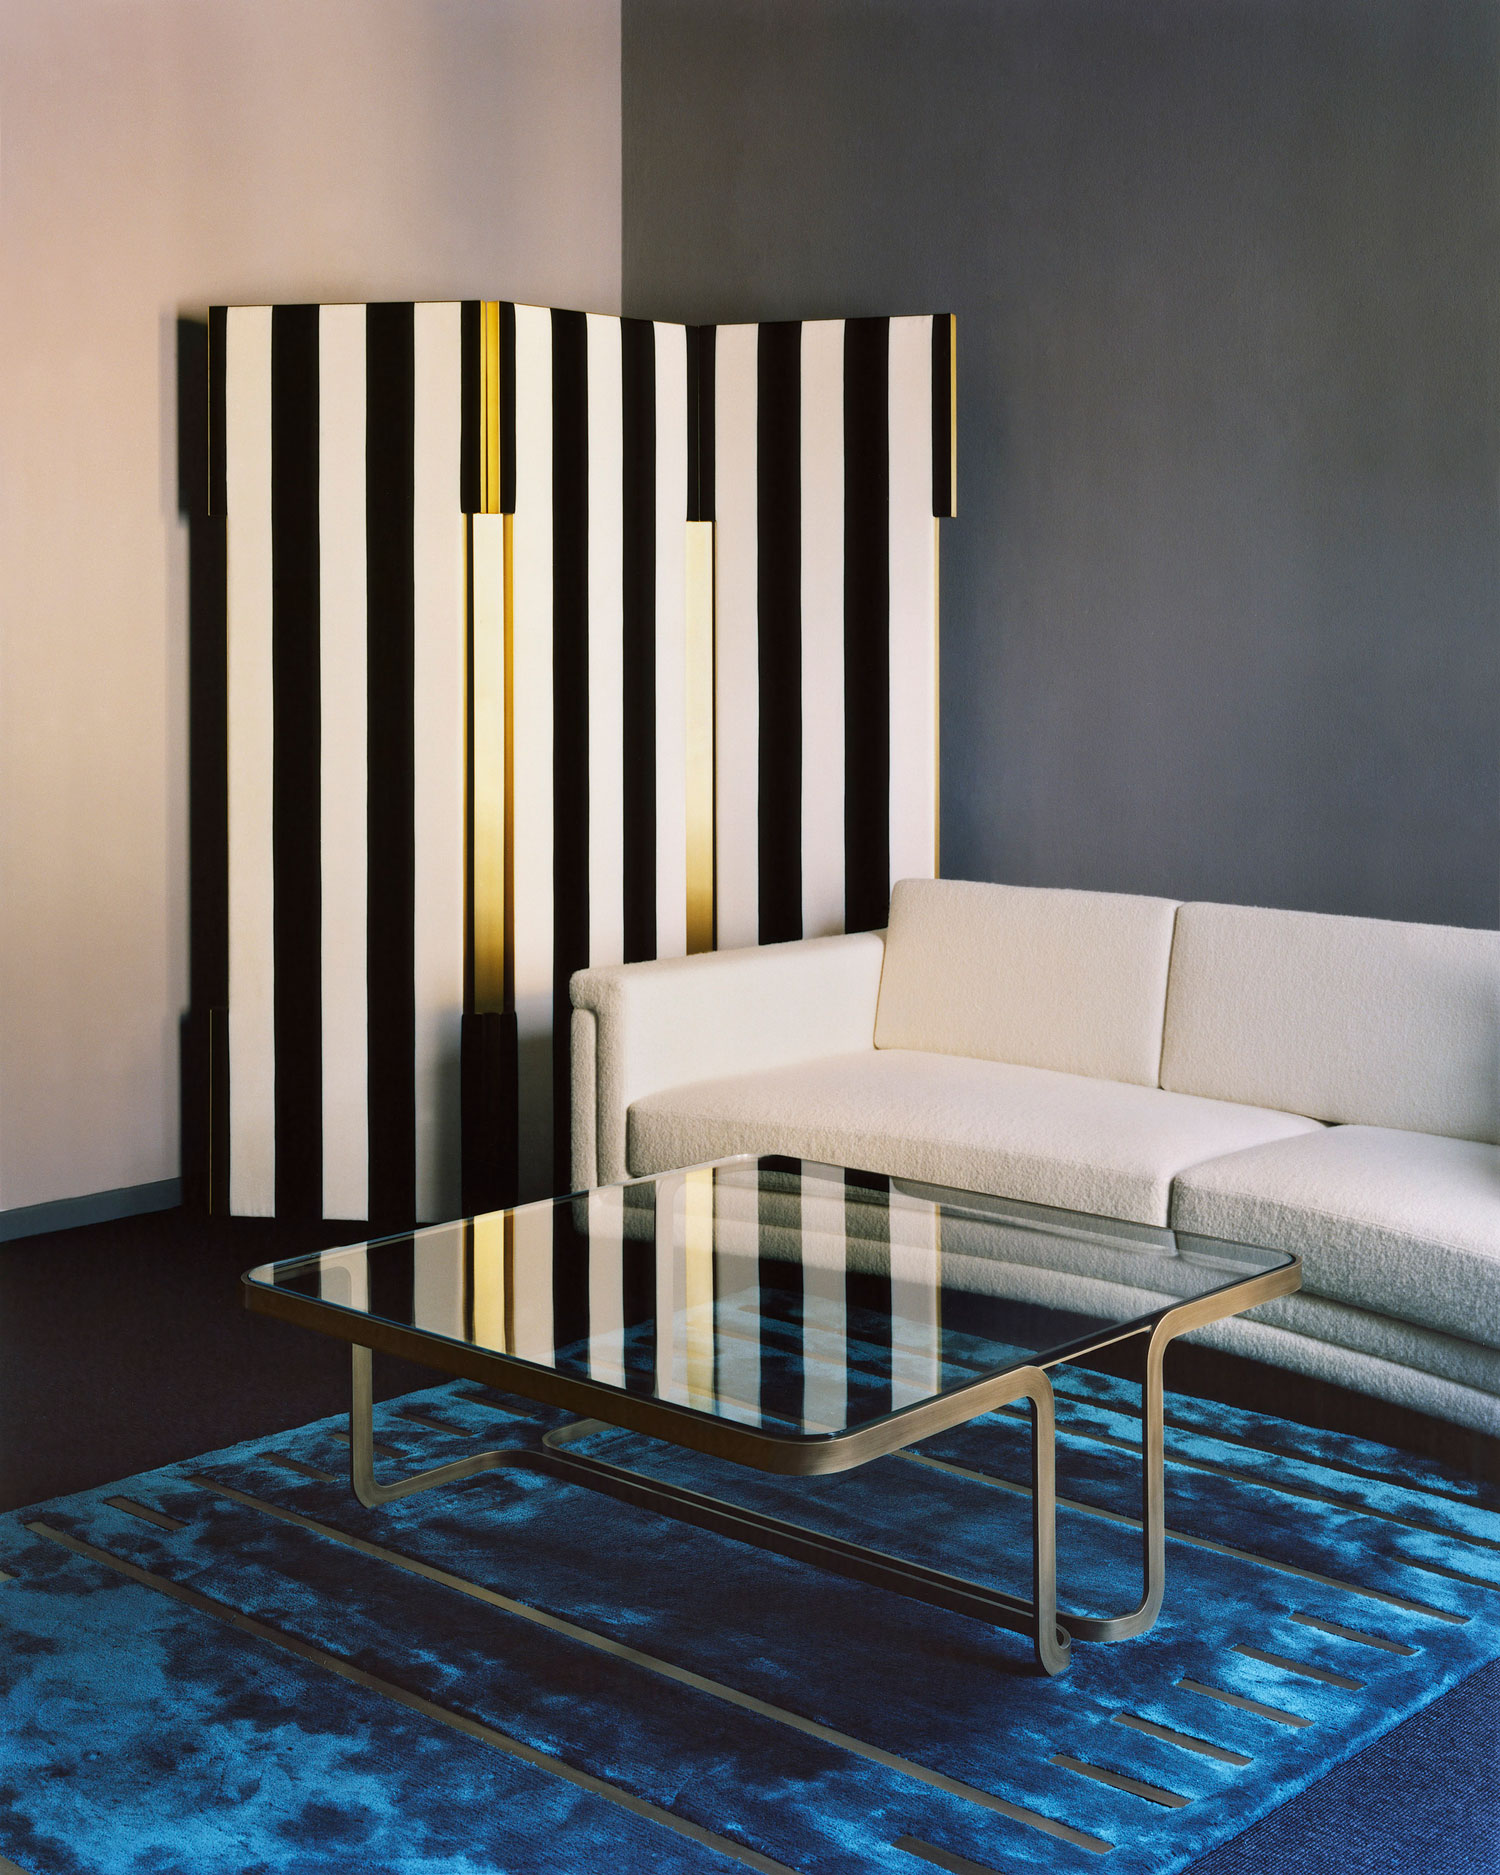 Lazzarini Pickering's Furniture Collection for Marta Sala Editions | Yellowtrace